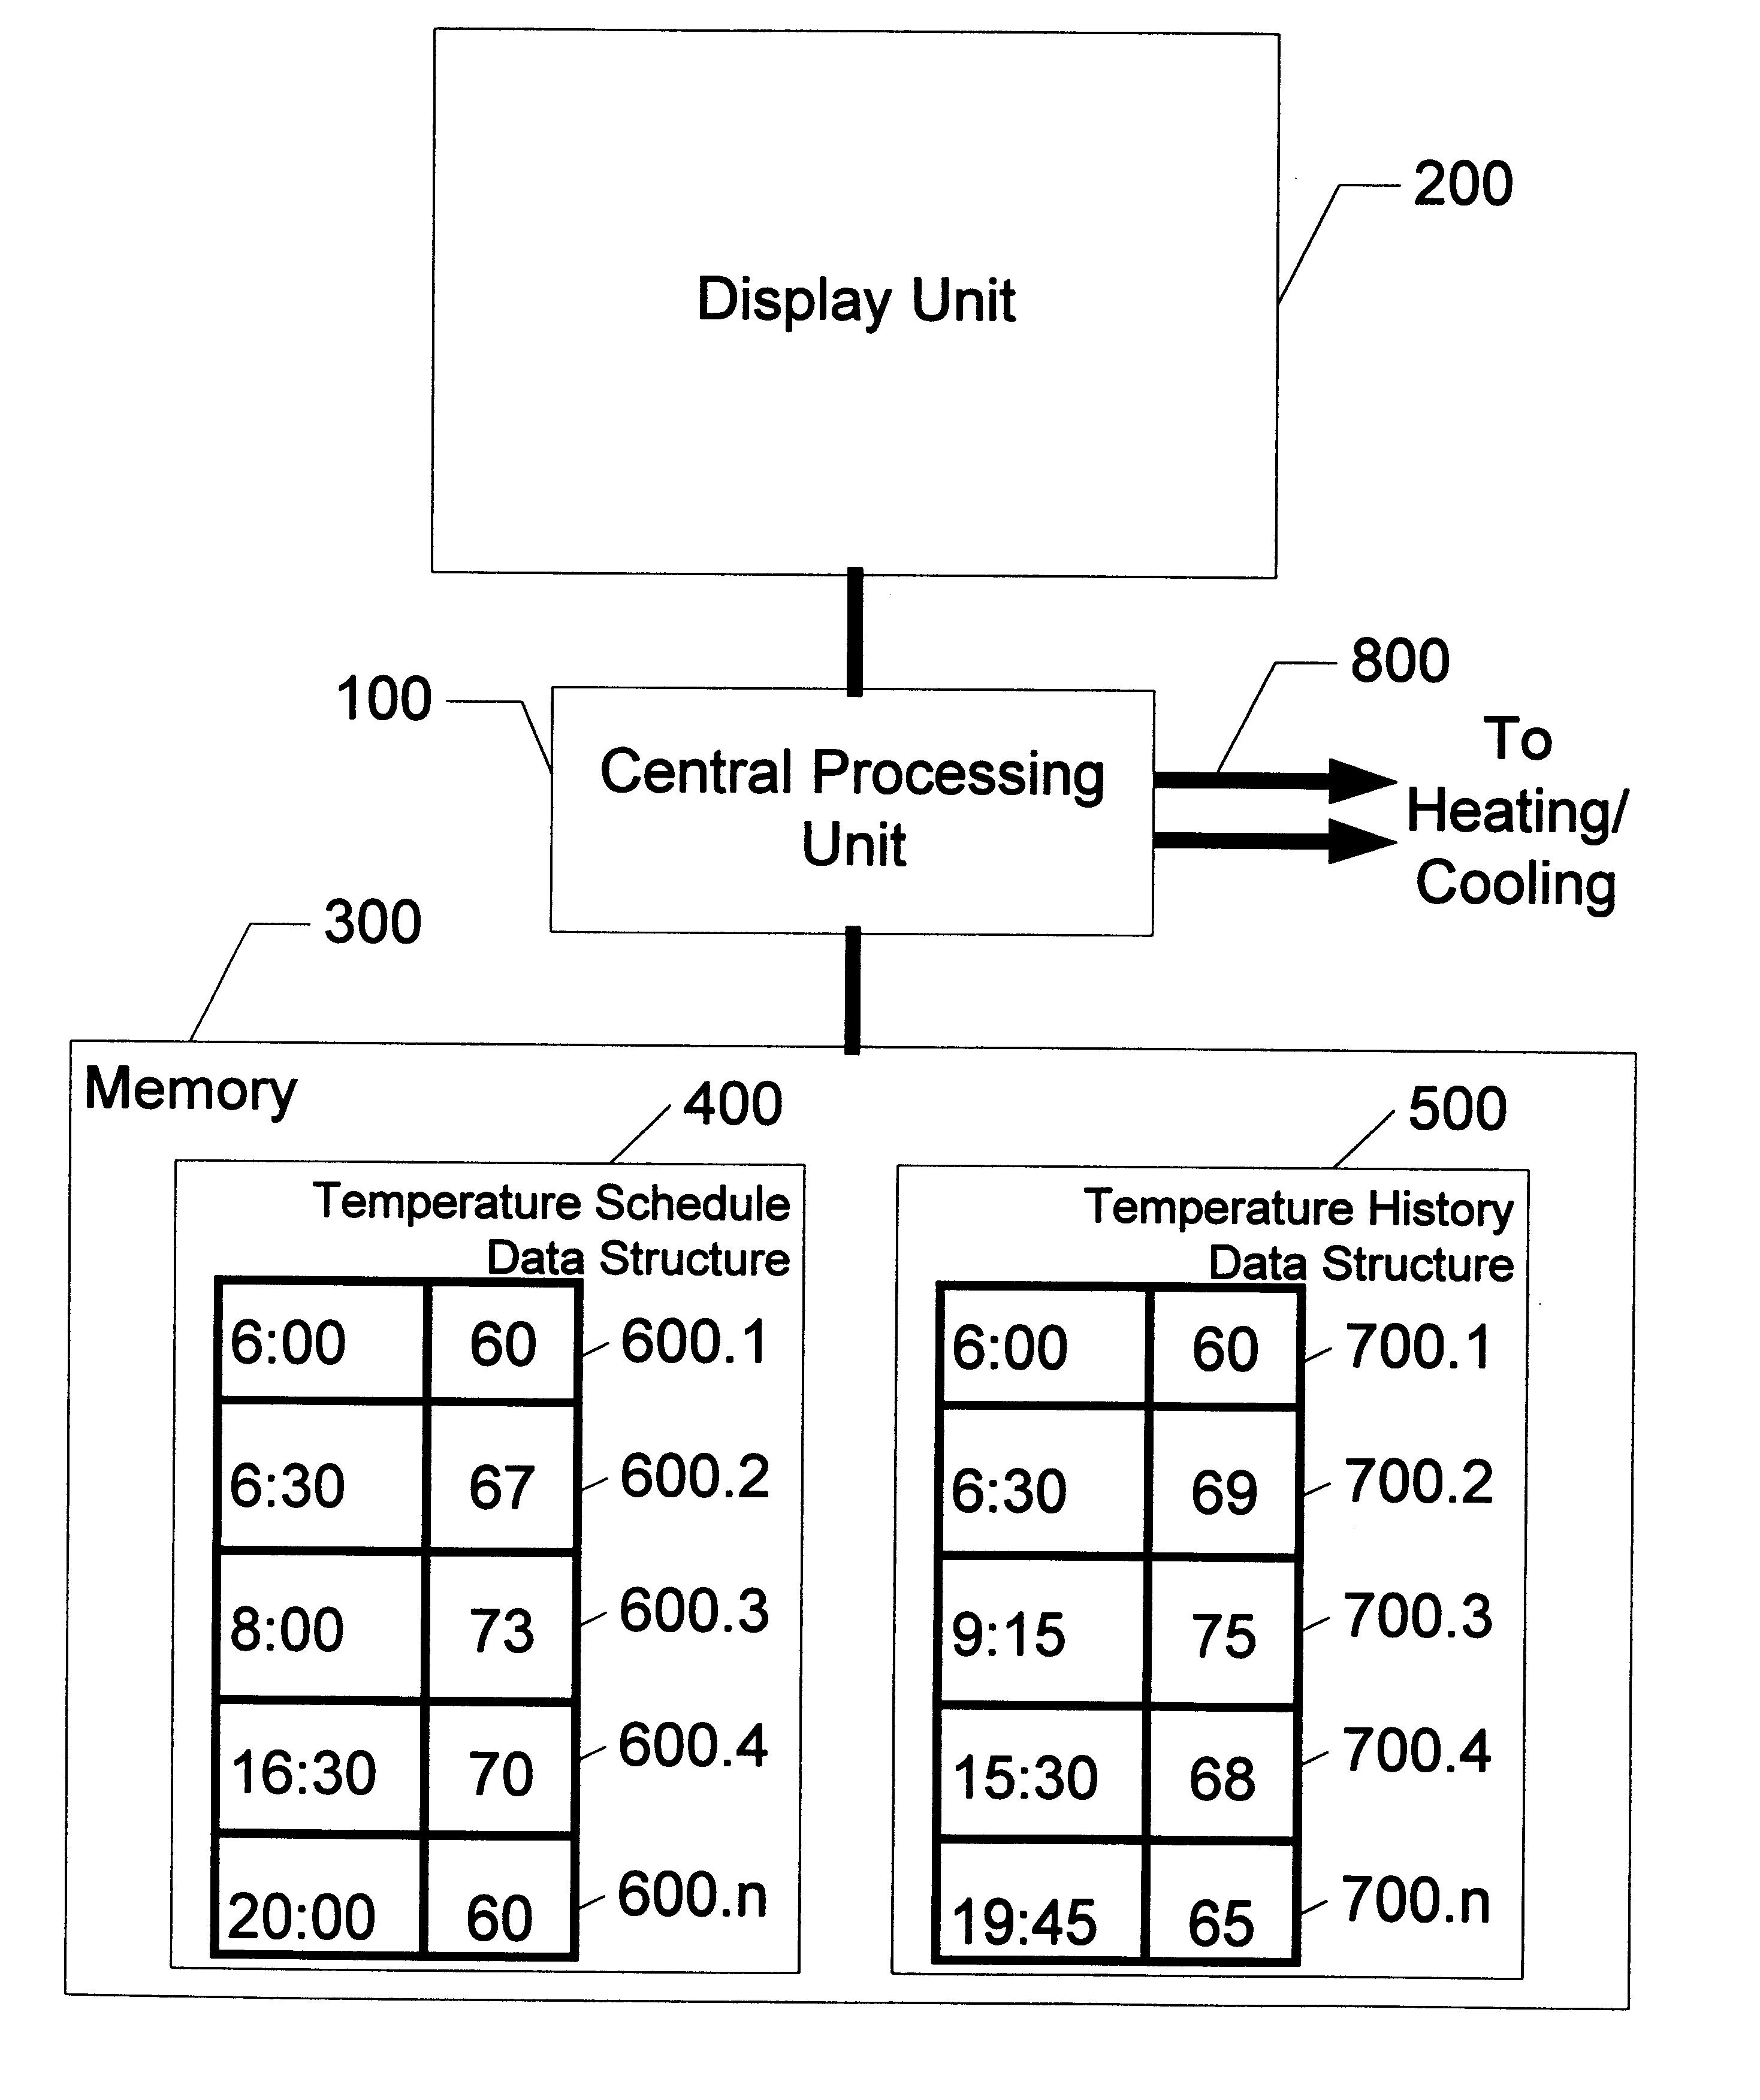 US06595430 20030722 D00000 ranco humidistat wiring diagram ewiring ranco humidistat wiring diagram at cos-gaming.co